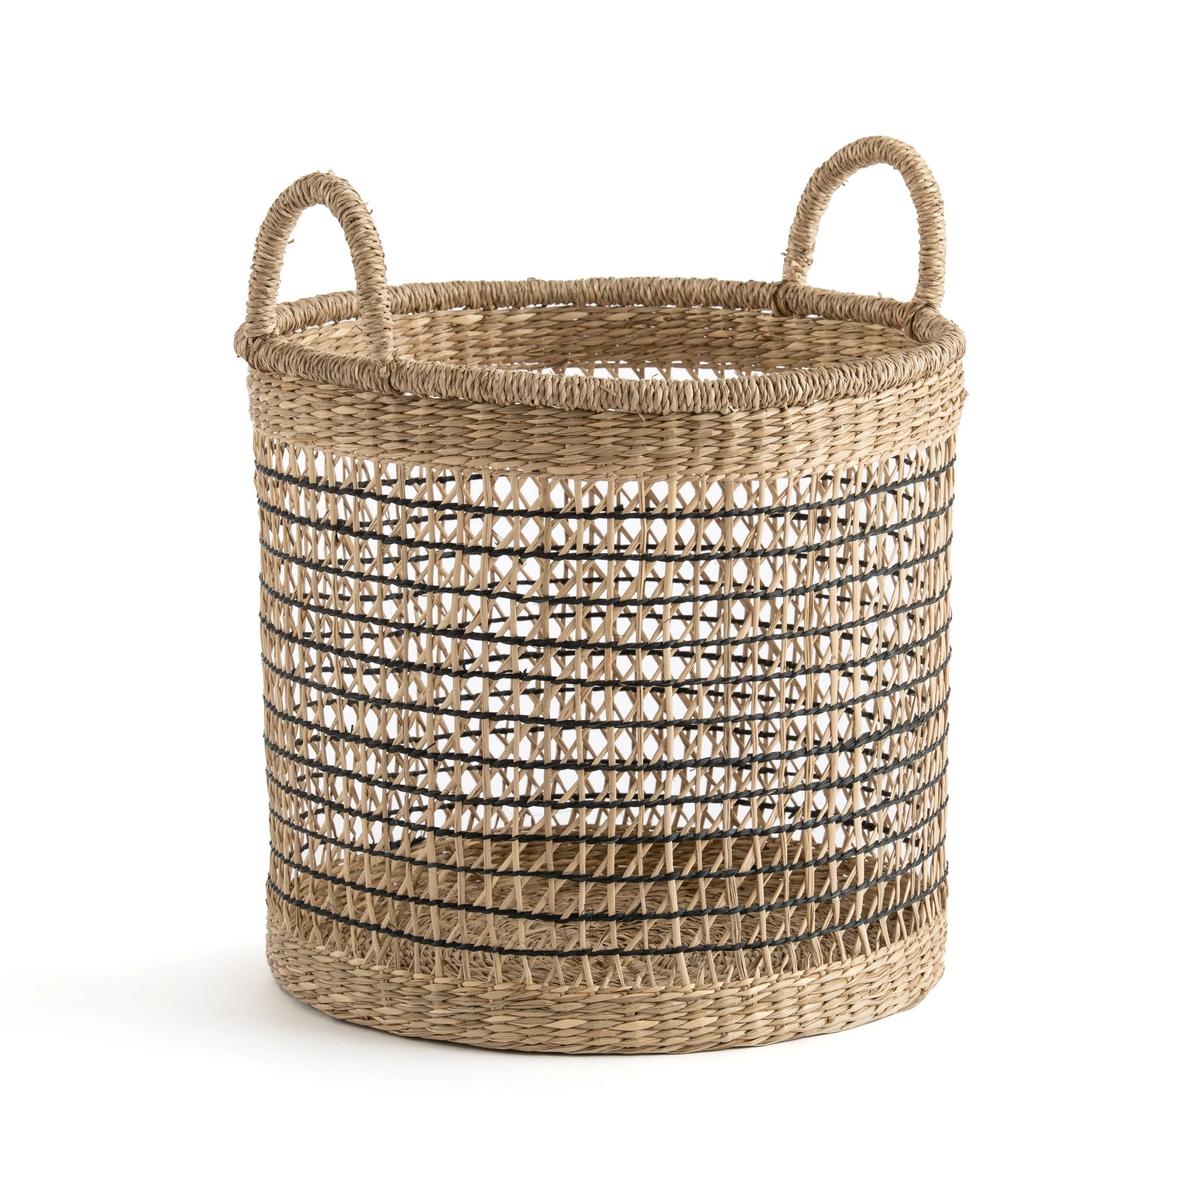 An image of Kezia Rund Woven Grass Openwork Basket by La Redoute